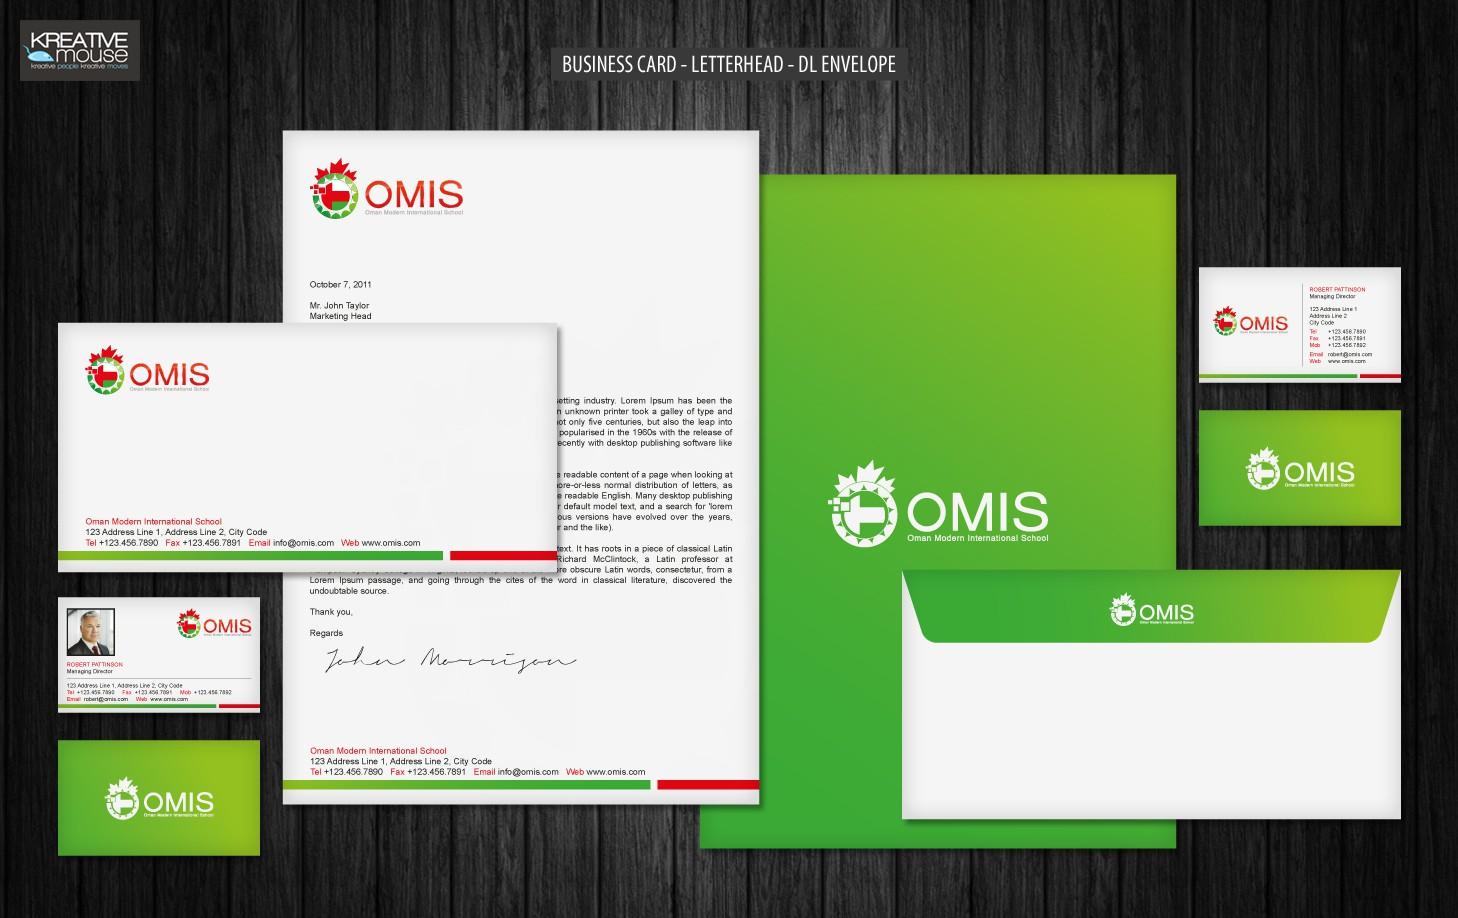 Oman Modern International School (OMIS) needs a new stationery